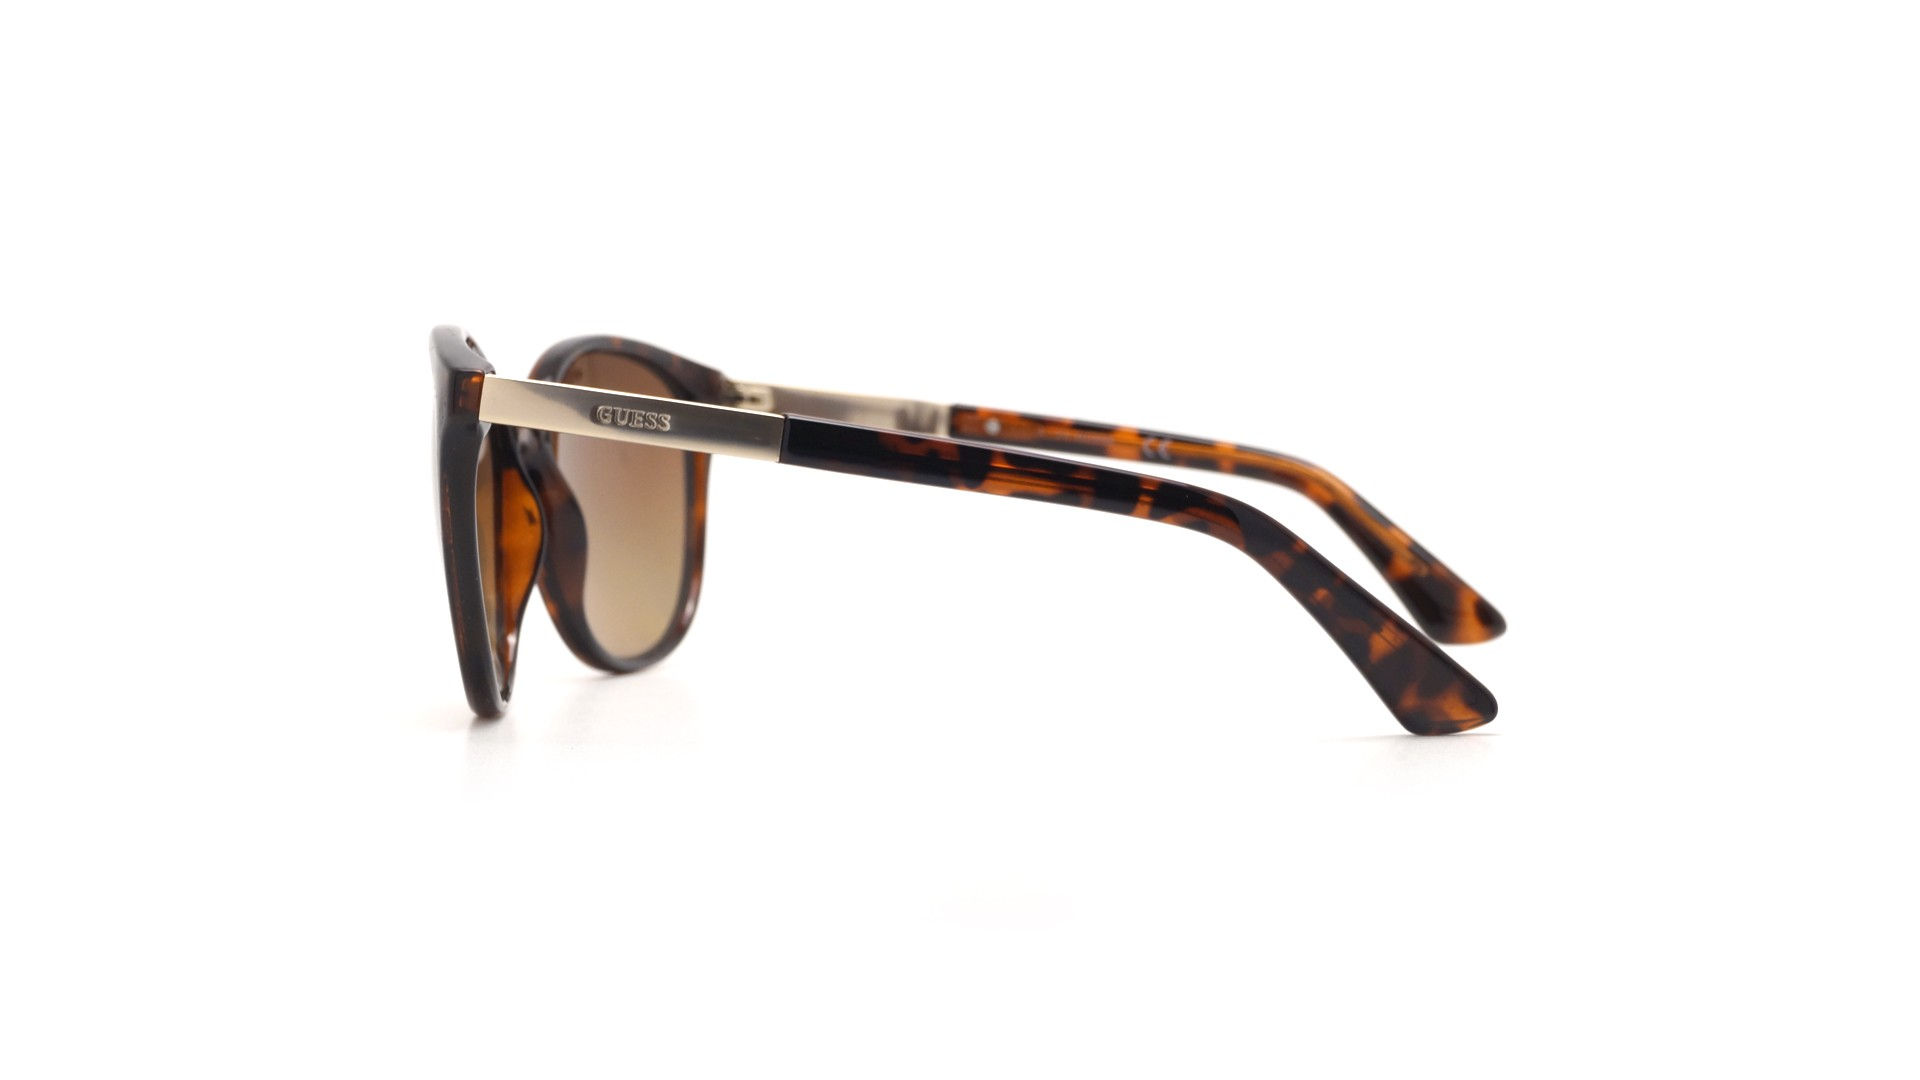 fecd11197d Sunglasses Guess GU7390 52H 58-16 Tortoise Large Polarized